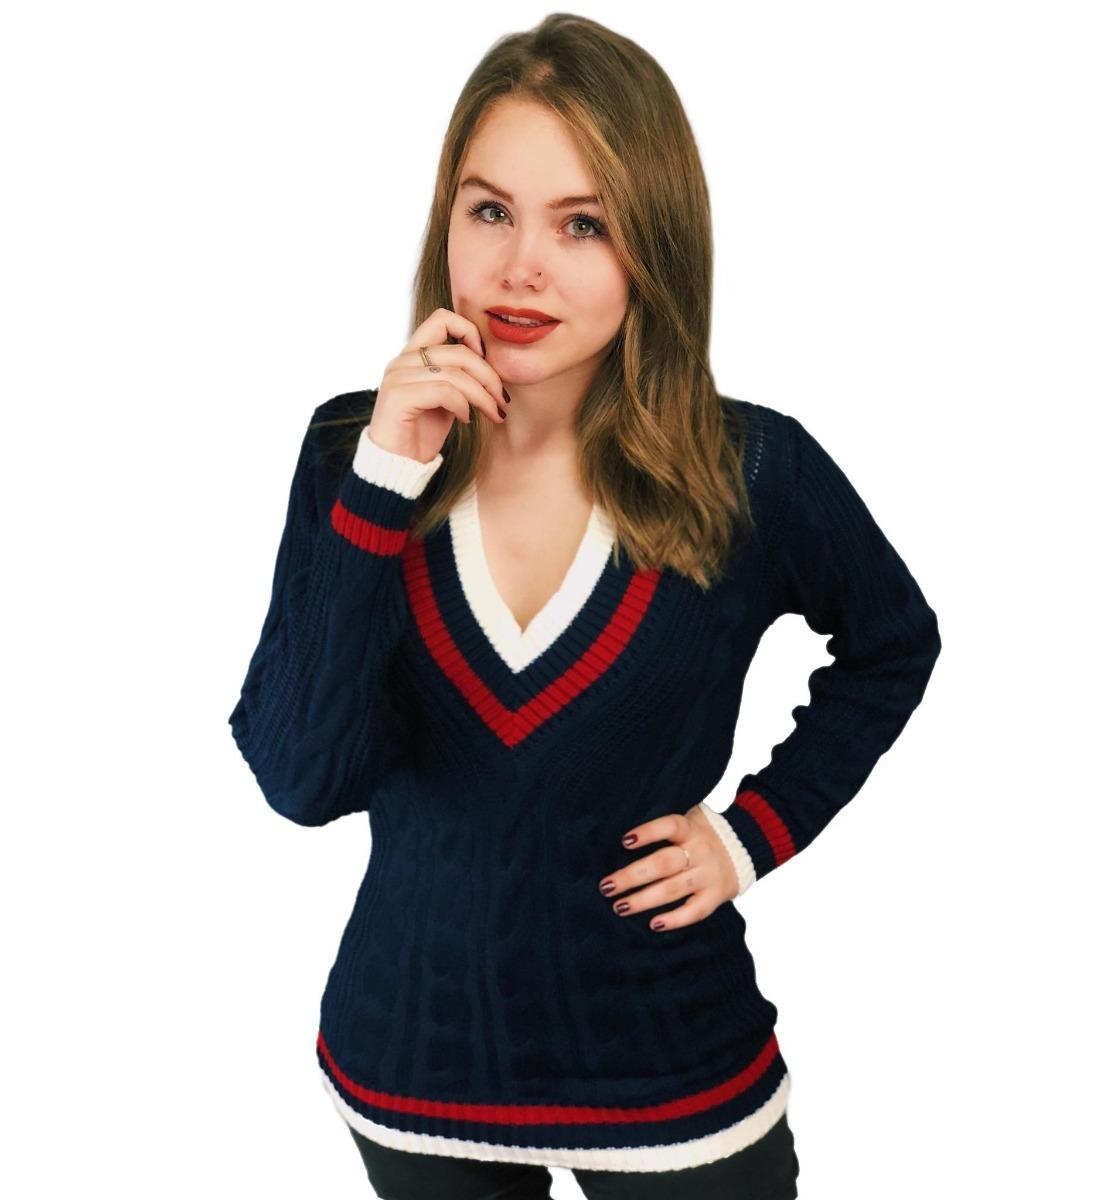 170905ed42 blusa tricot tricô decote colegial feminino manga longa frio. Carregando  zoom.